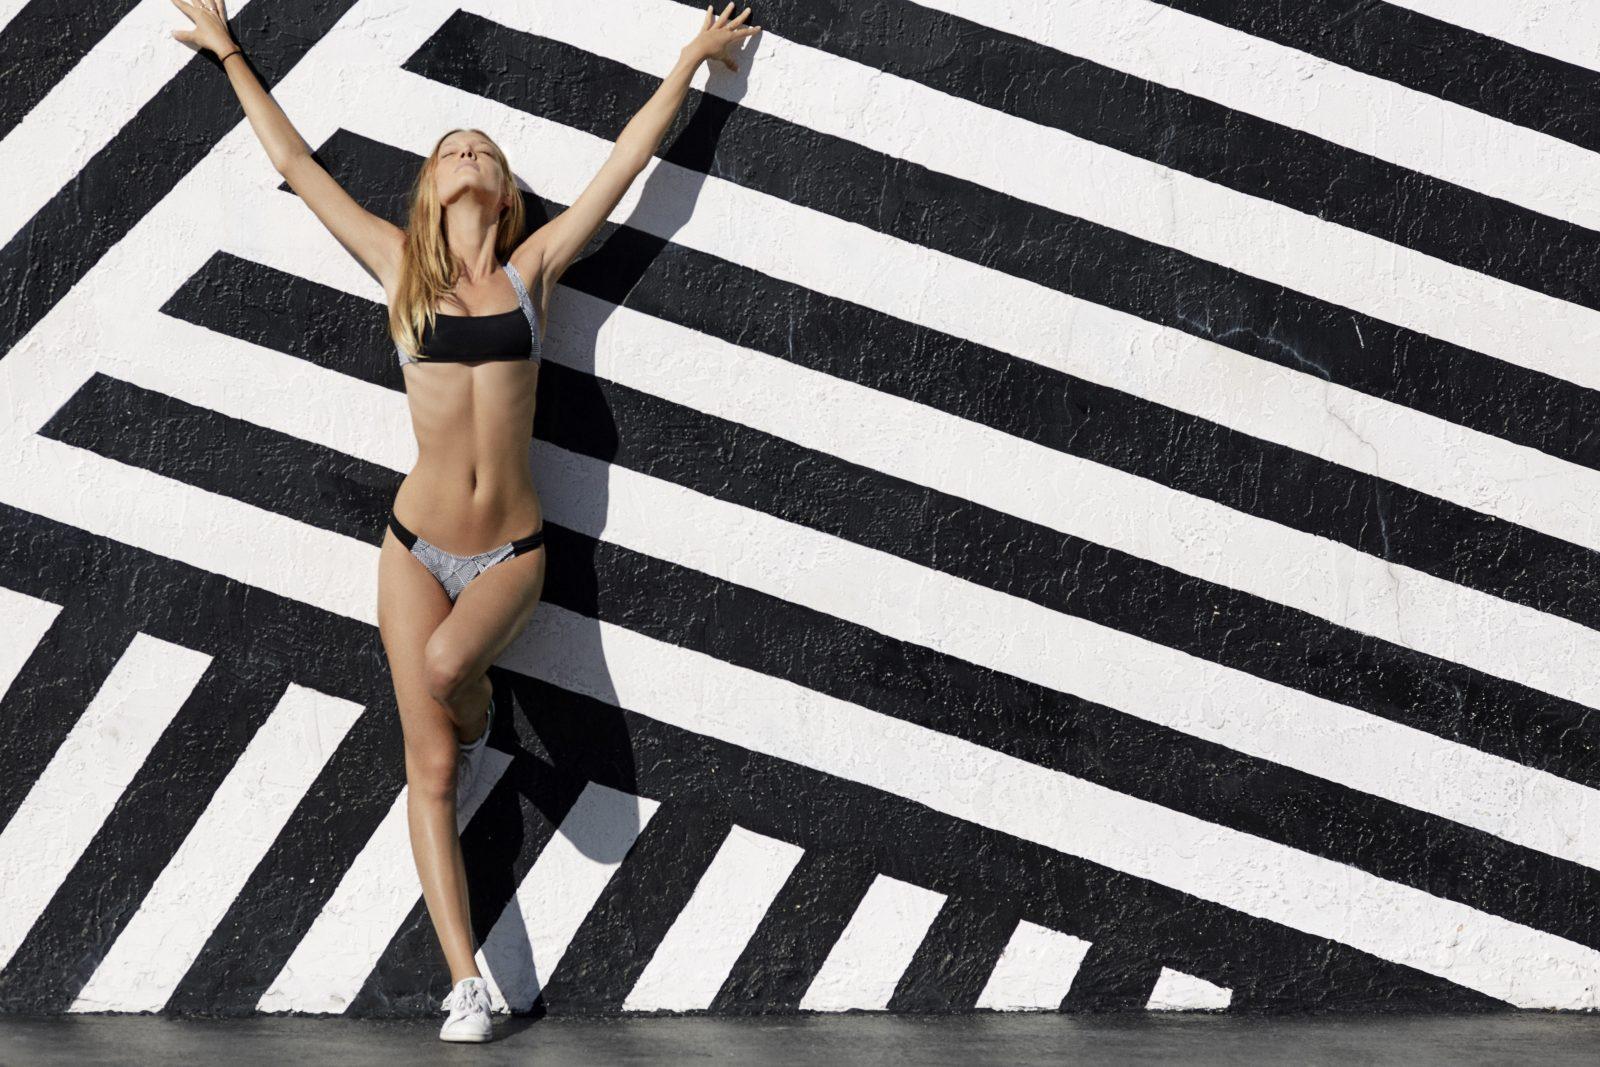 allSisters | Upcycling Swimwear aus Barcelona | Patricia Caballero und Alba Bisbal | Swimwear von allSisters | Foto: allSisters | GROSS∆RTIG